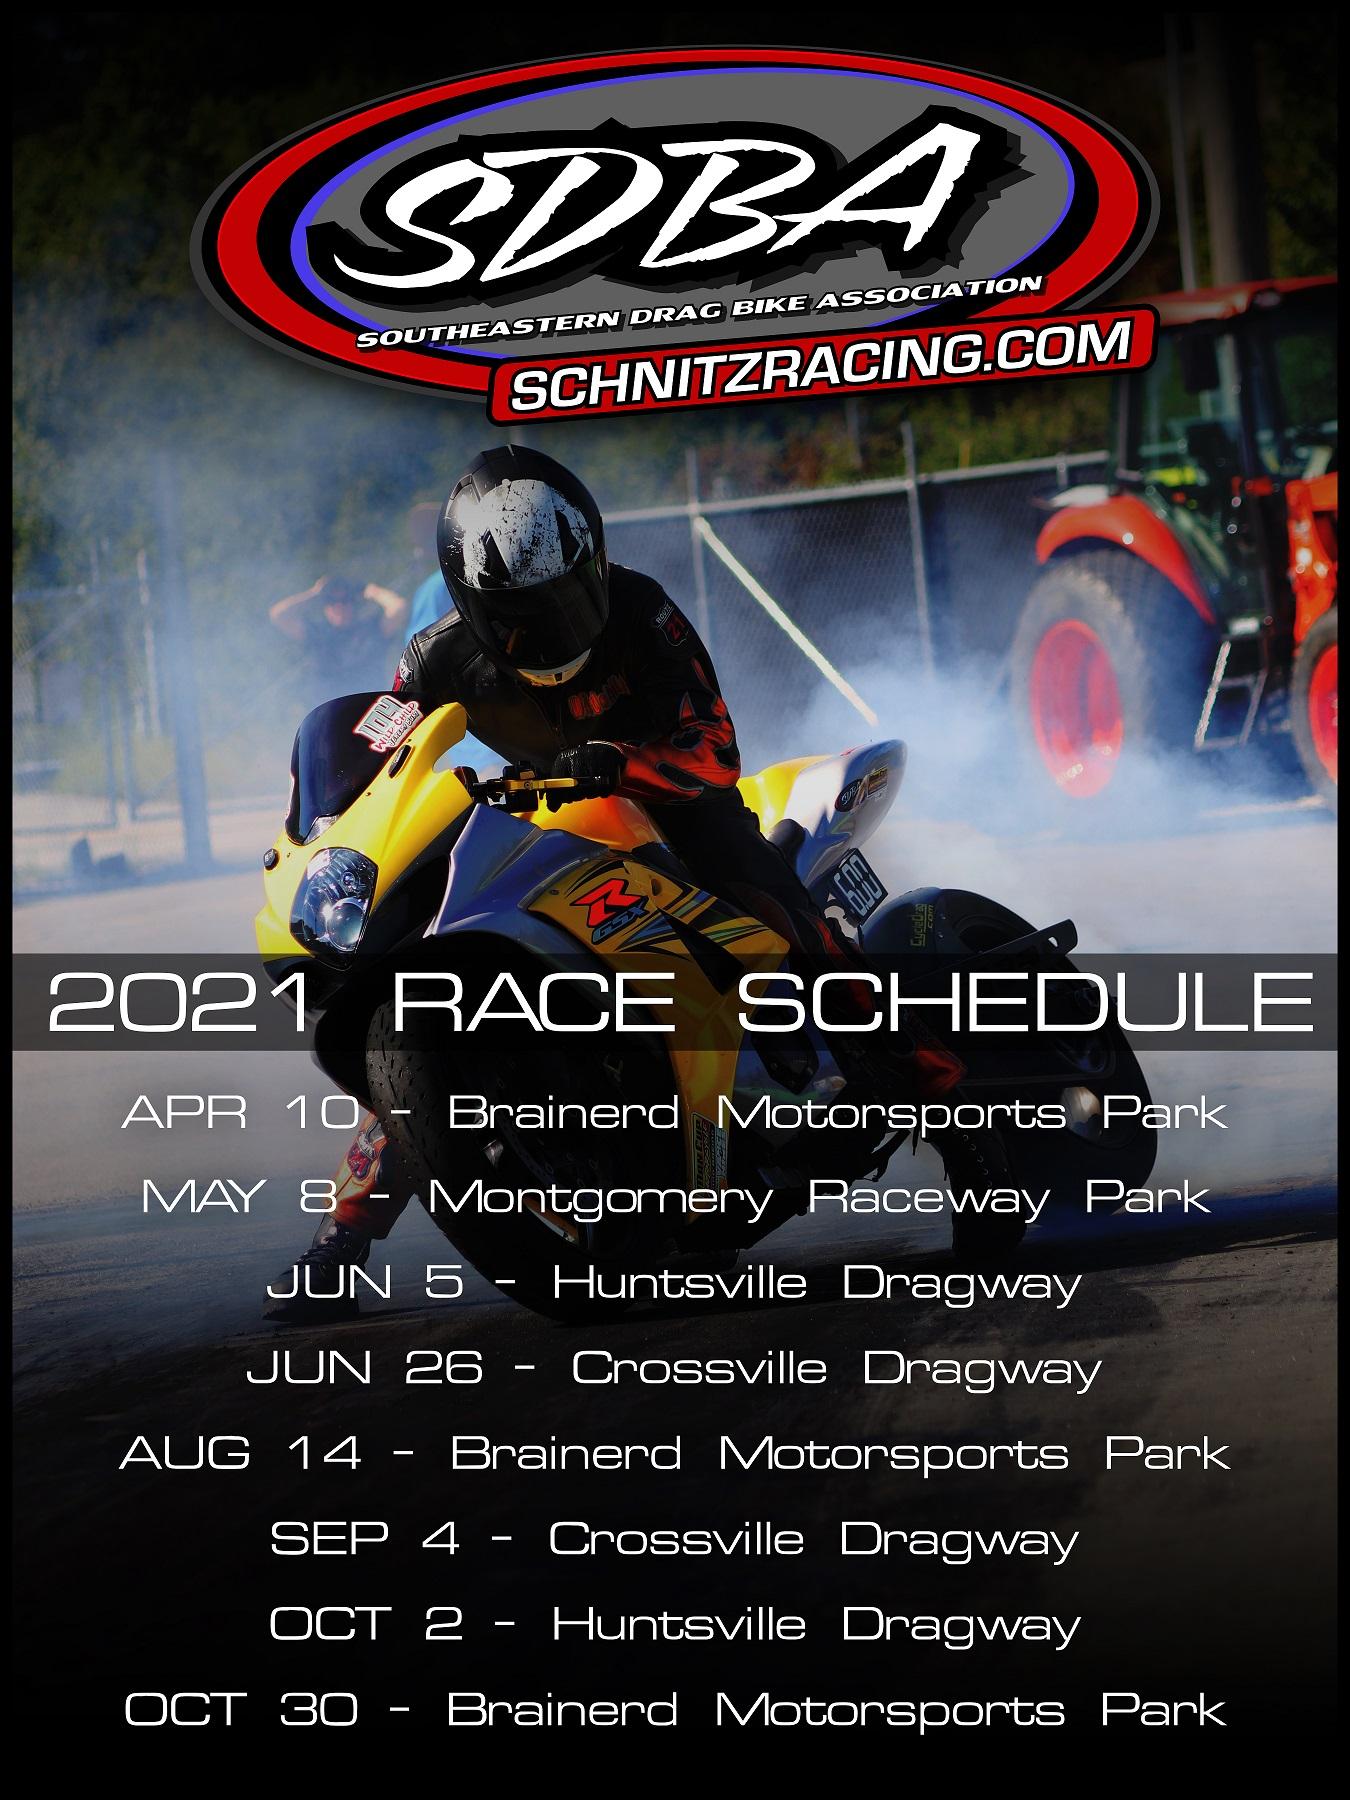 SDBA event schedule